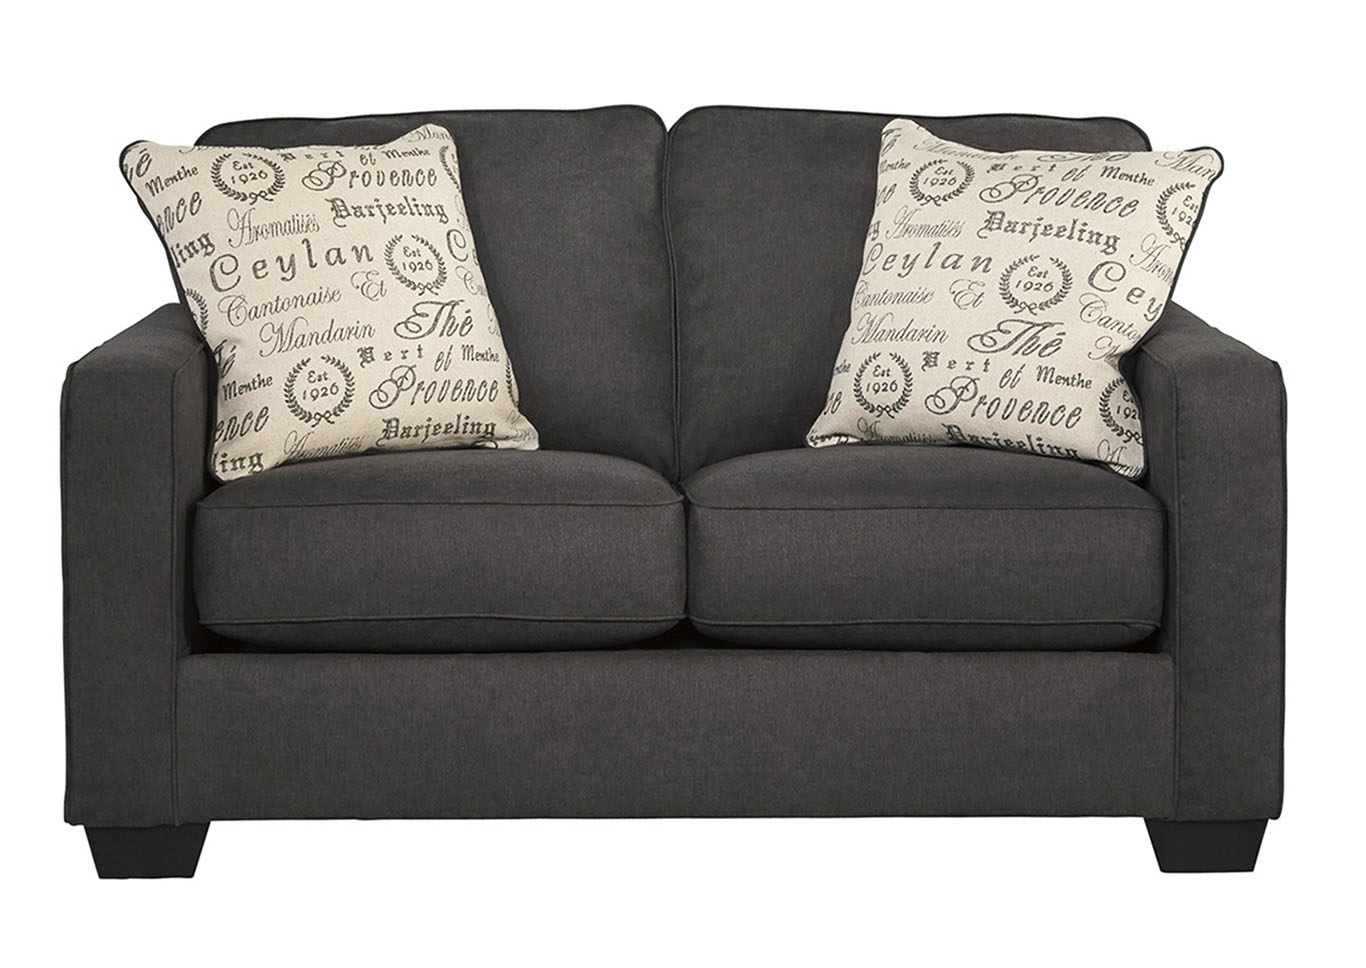 Frugal Furniture   Boston, Mattapan, Jamaica Plain, Dorchester MA Alenya  Charcoal Loveseat